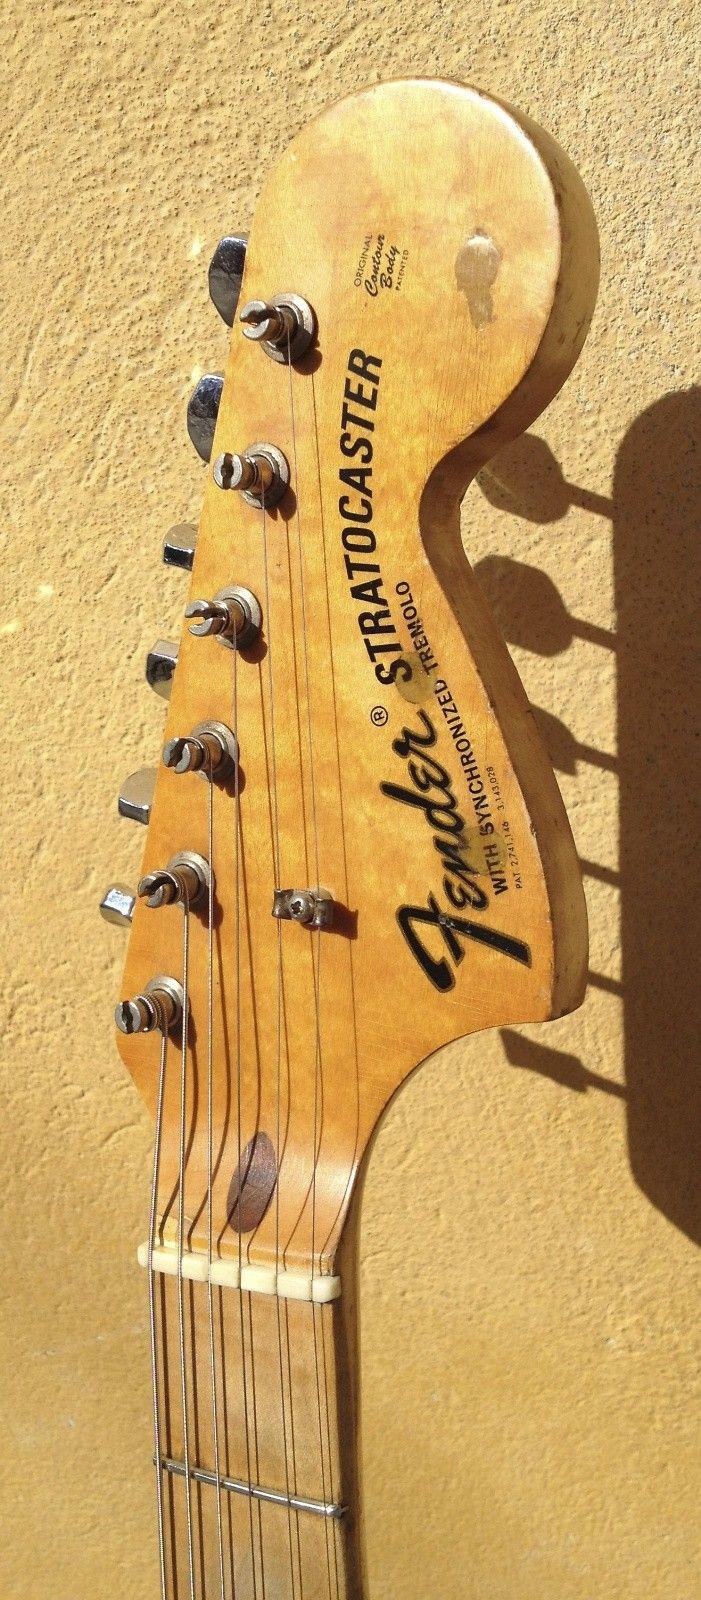 Fender Stratocaster 1971 Black custom color and Maple neck | Reverb